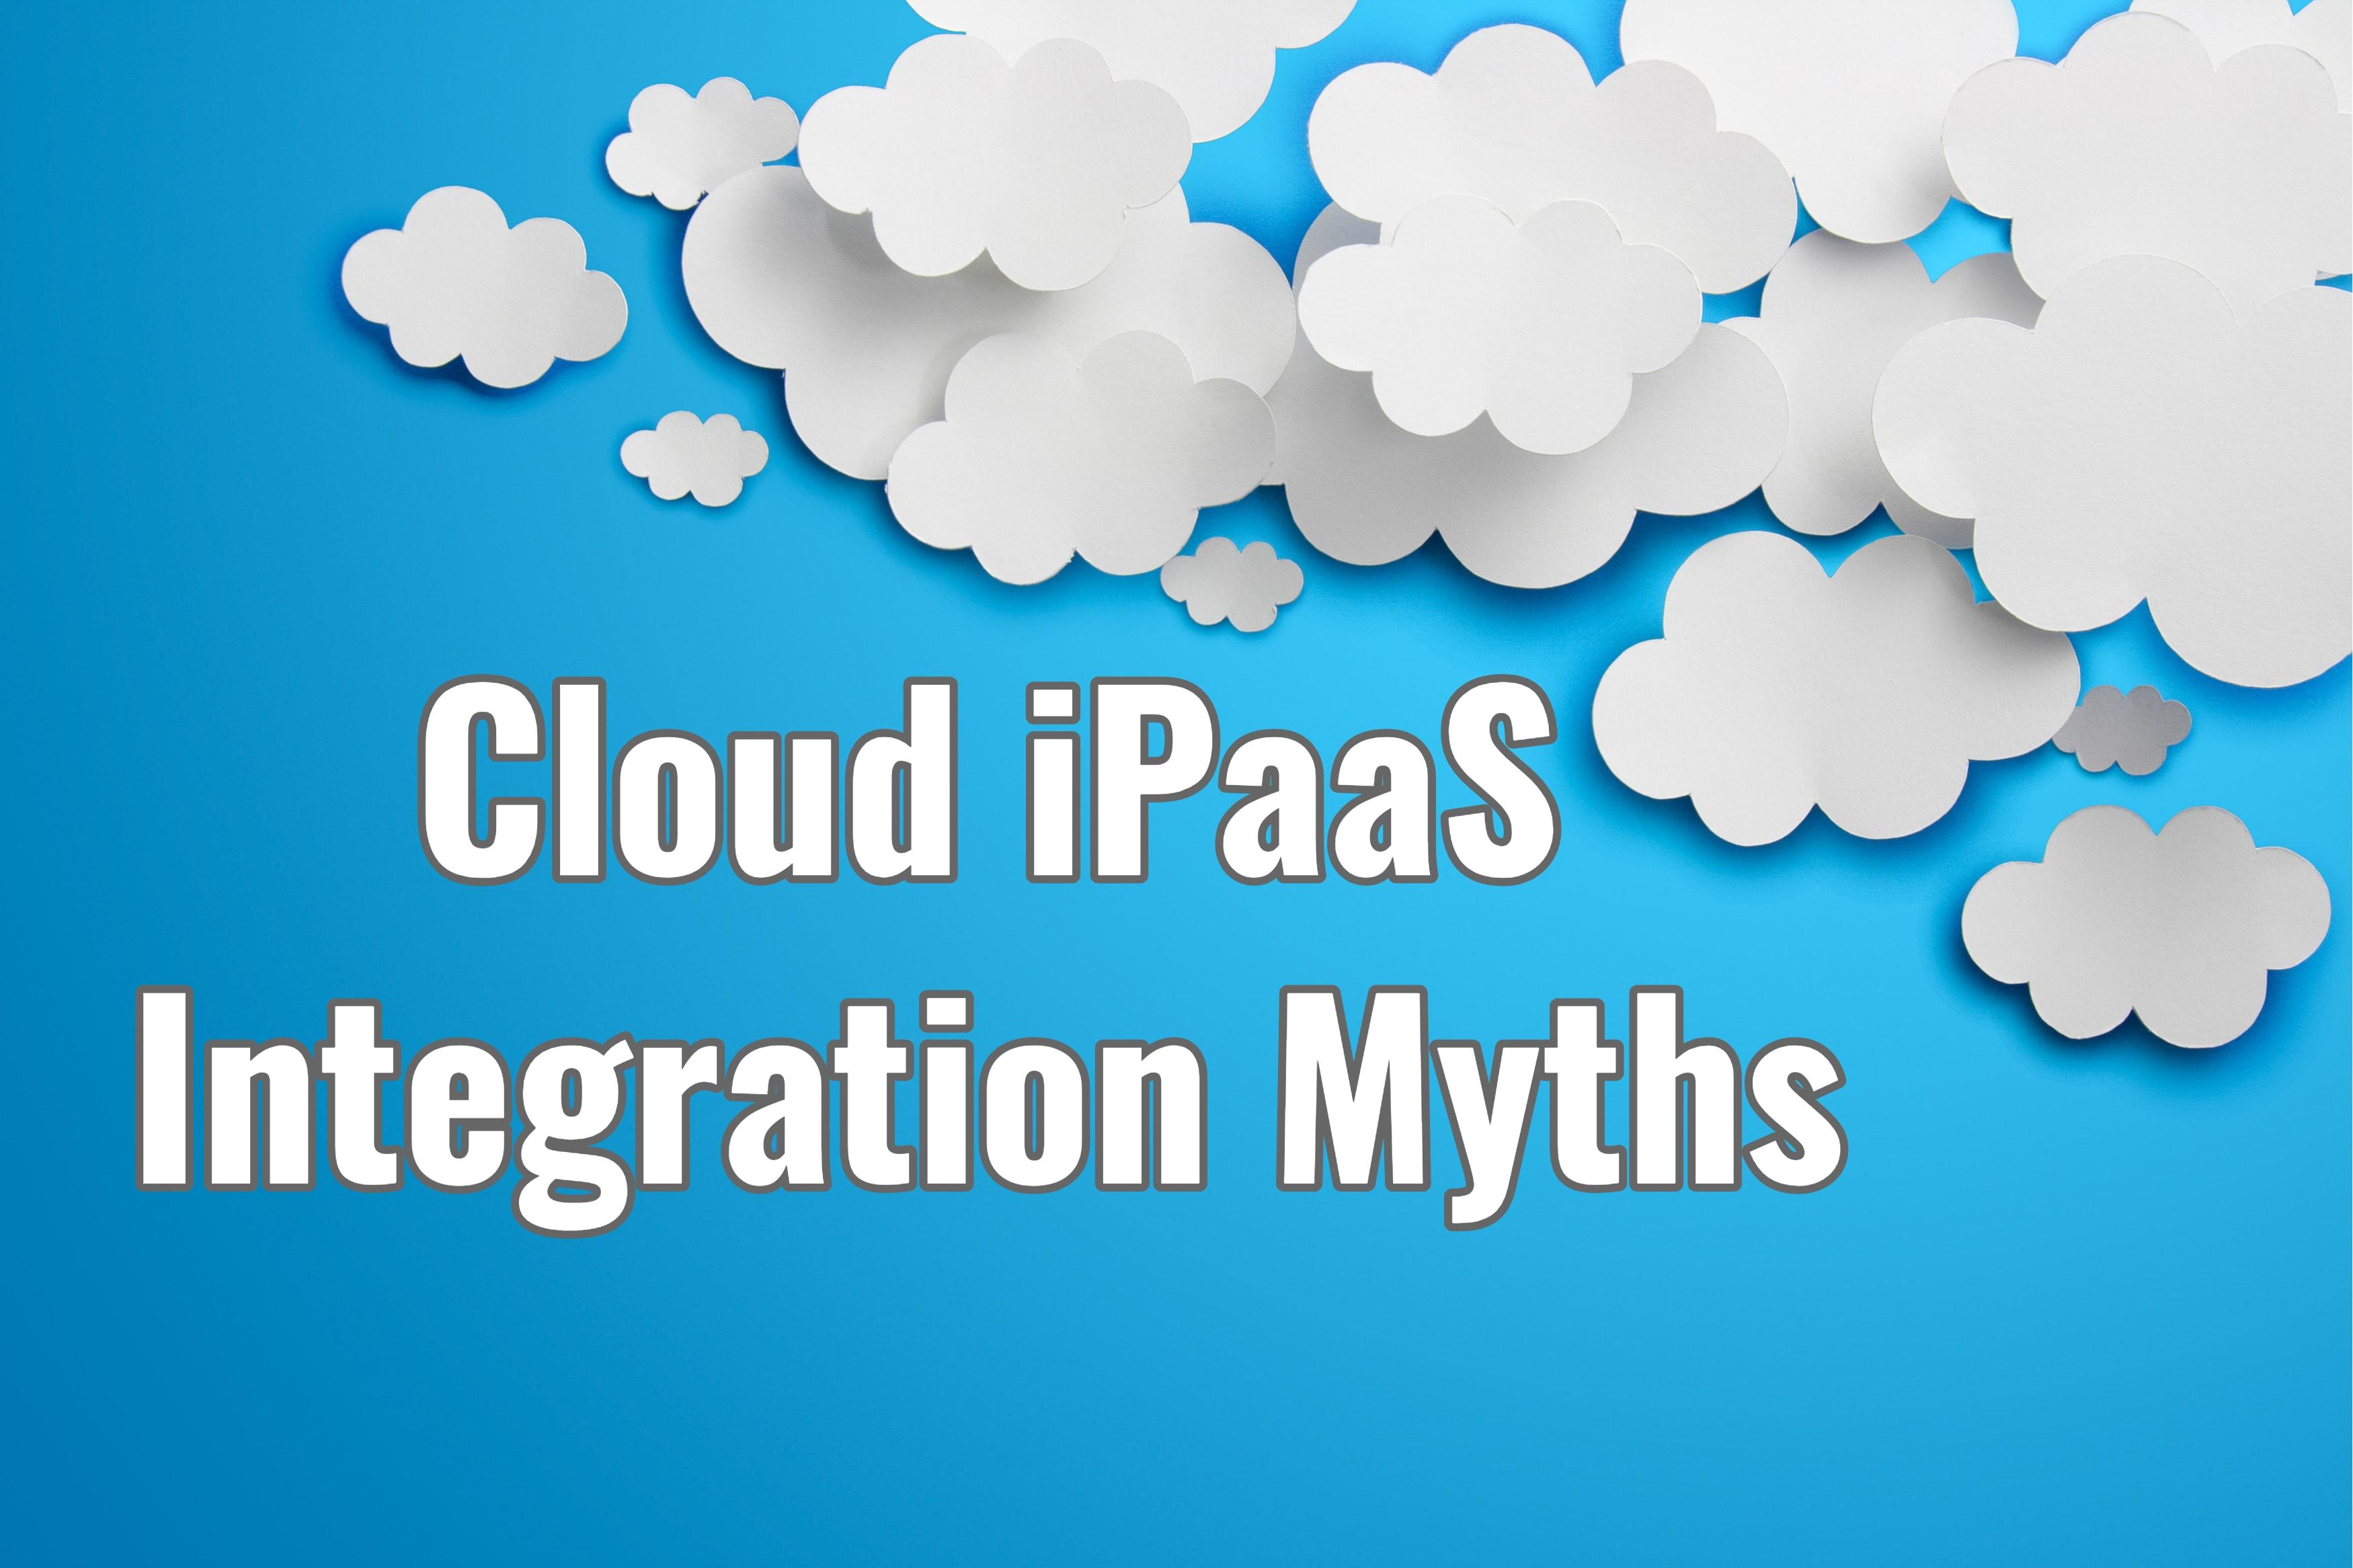 Cloud iPaaS Integration Myths That Just Aren't True